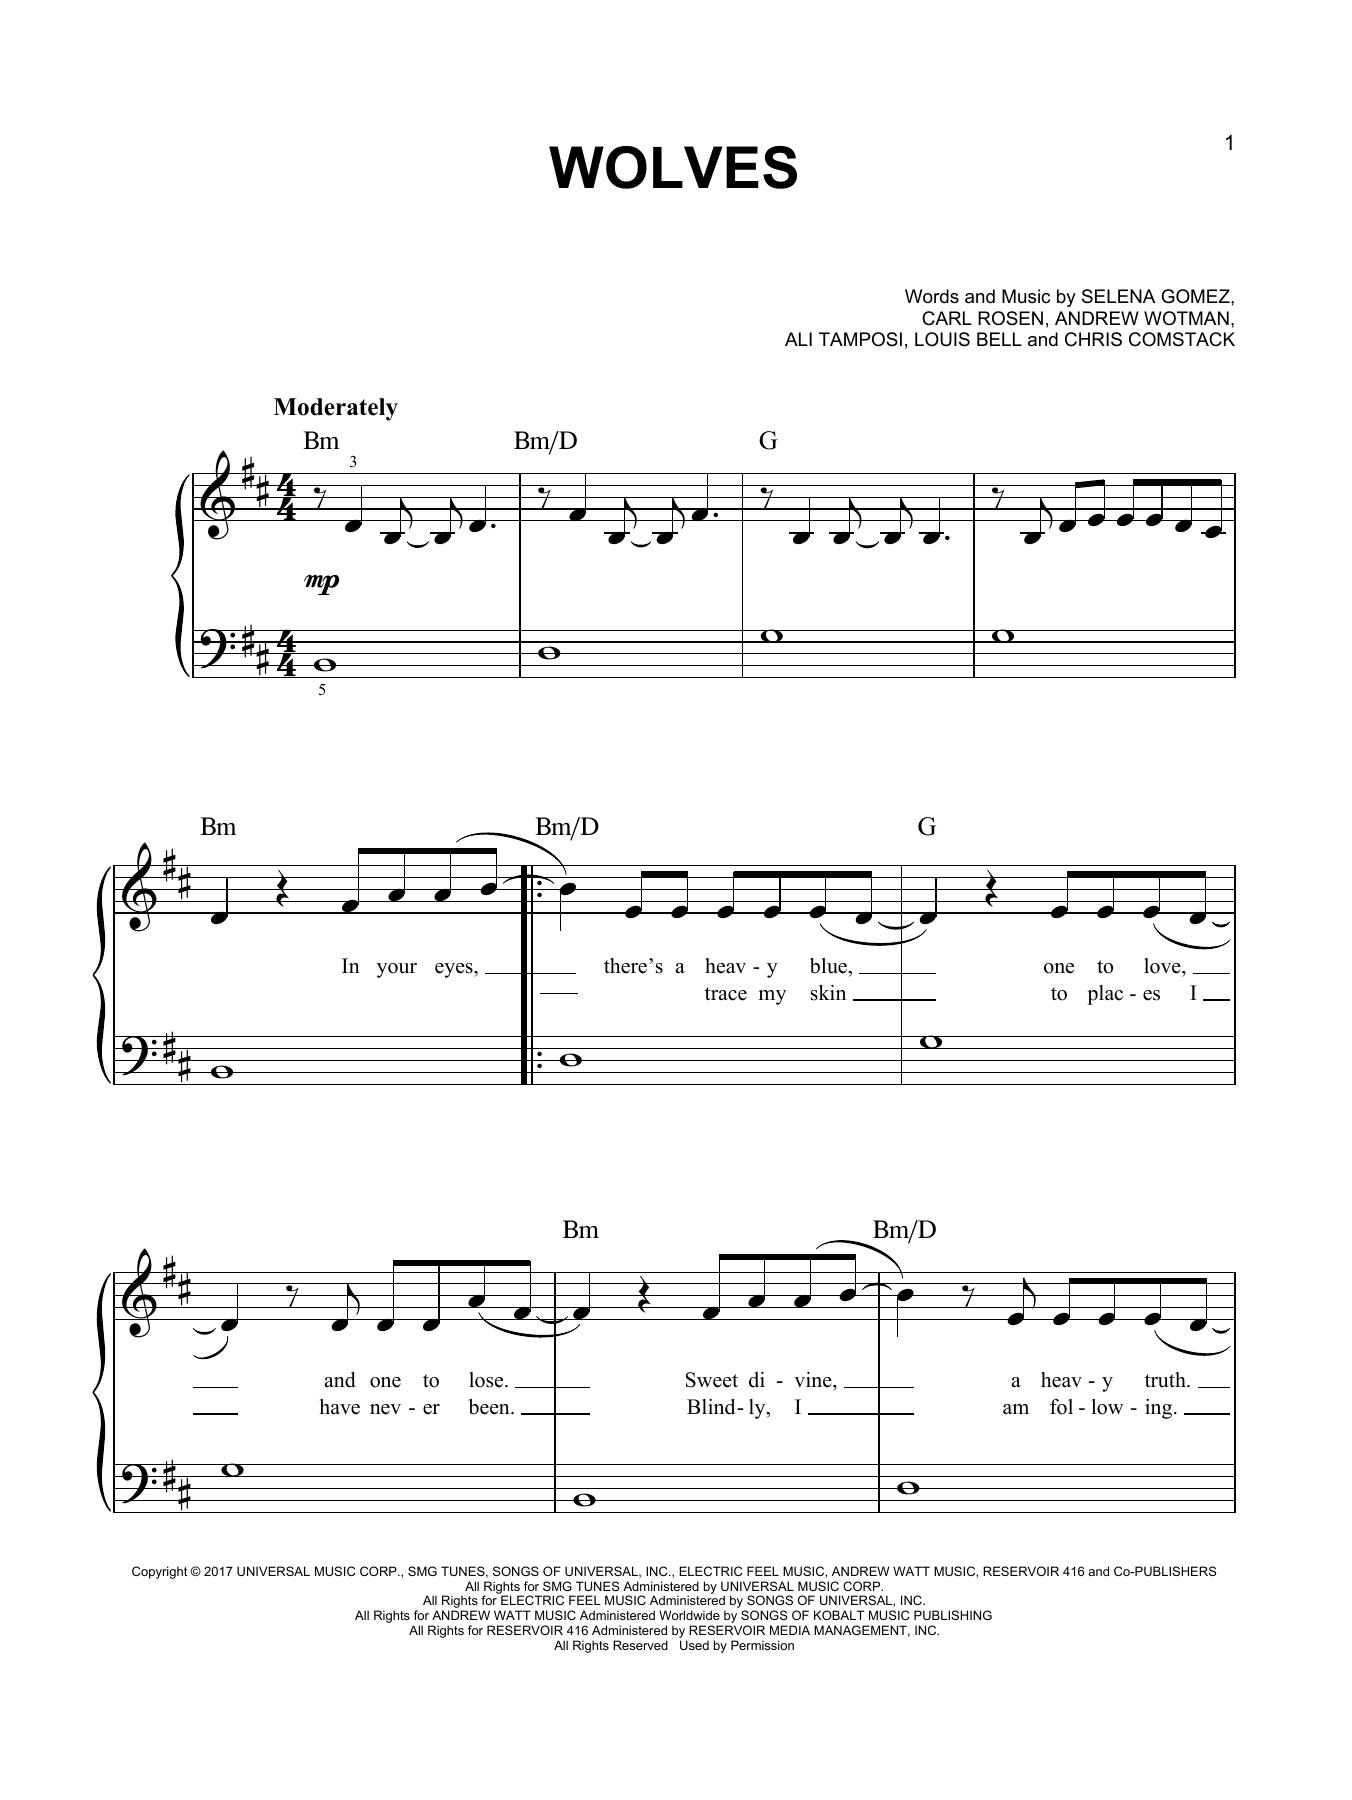 Selena Gomez & Marshmello 'Wolves' Sheet Music Notes, Chords   Download  Printable Piano, Vocal & Guitar Right Hand Melody   SKU 15